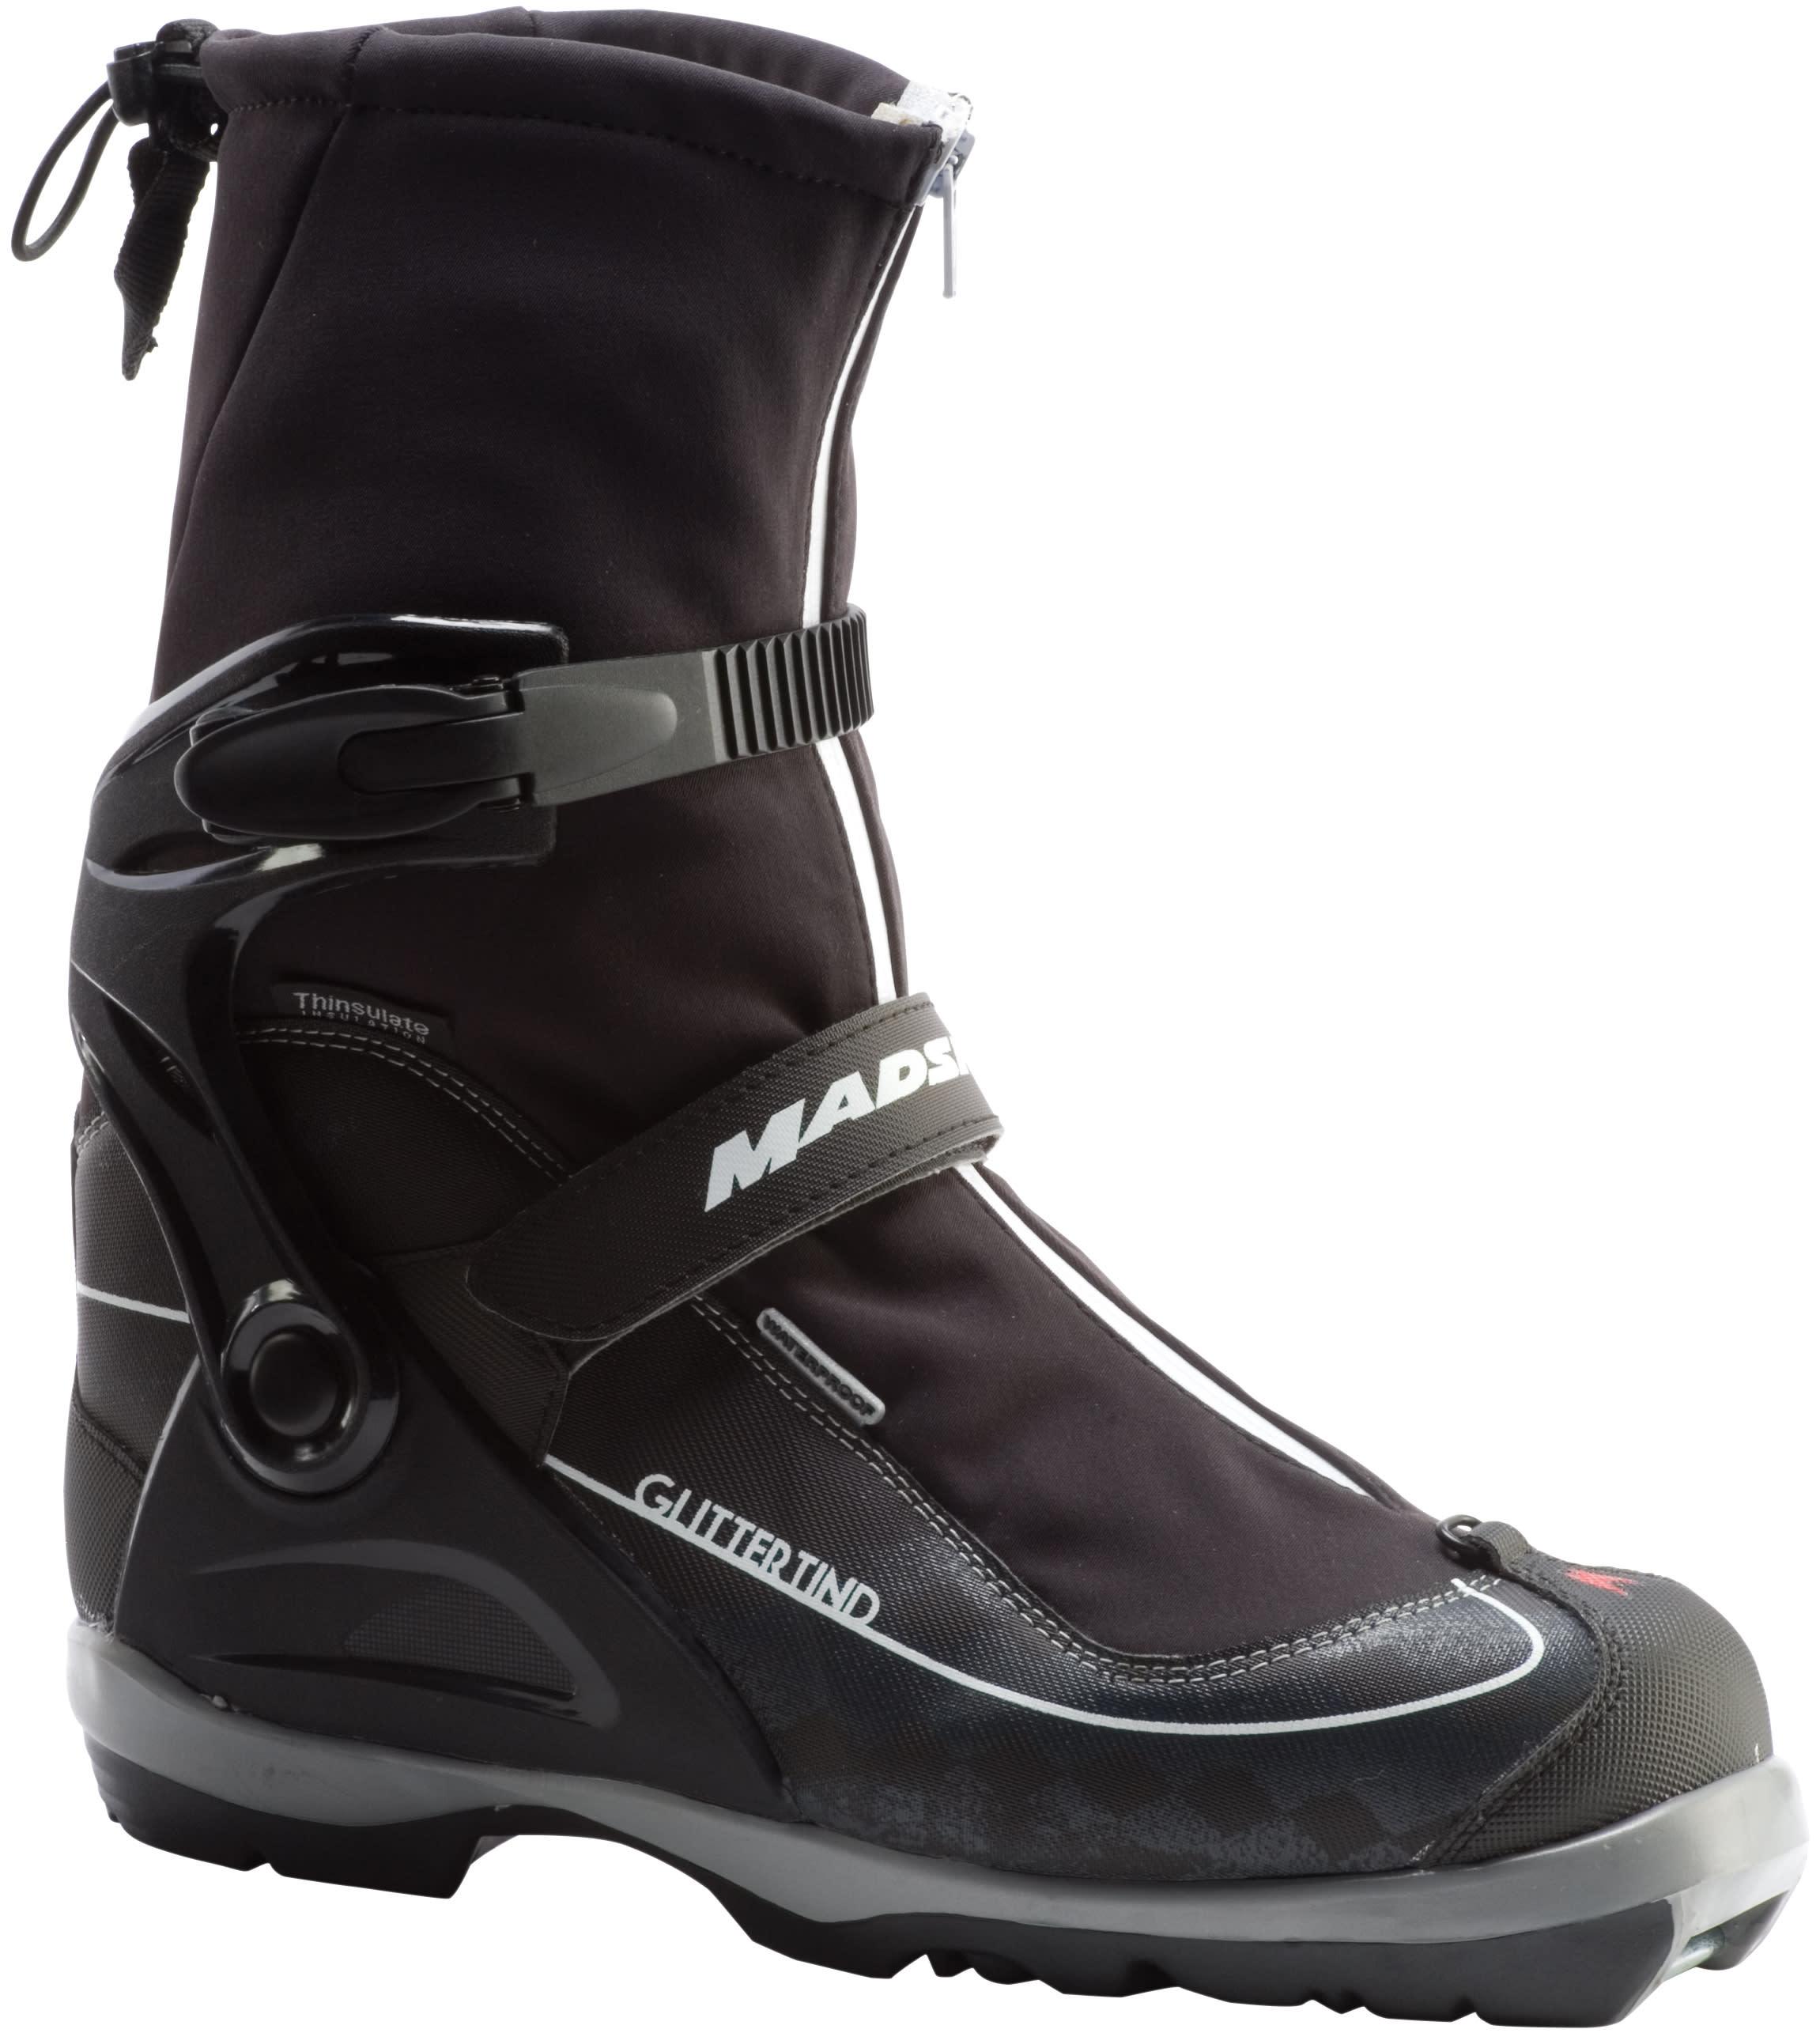 On Sale Madshus Glittertind Bc Xc Ski Boots Up To 45 Off